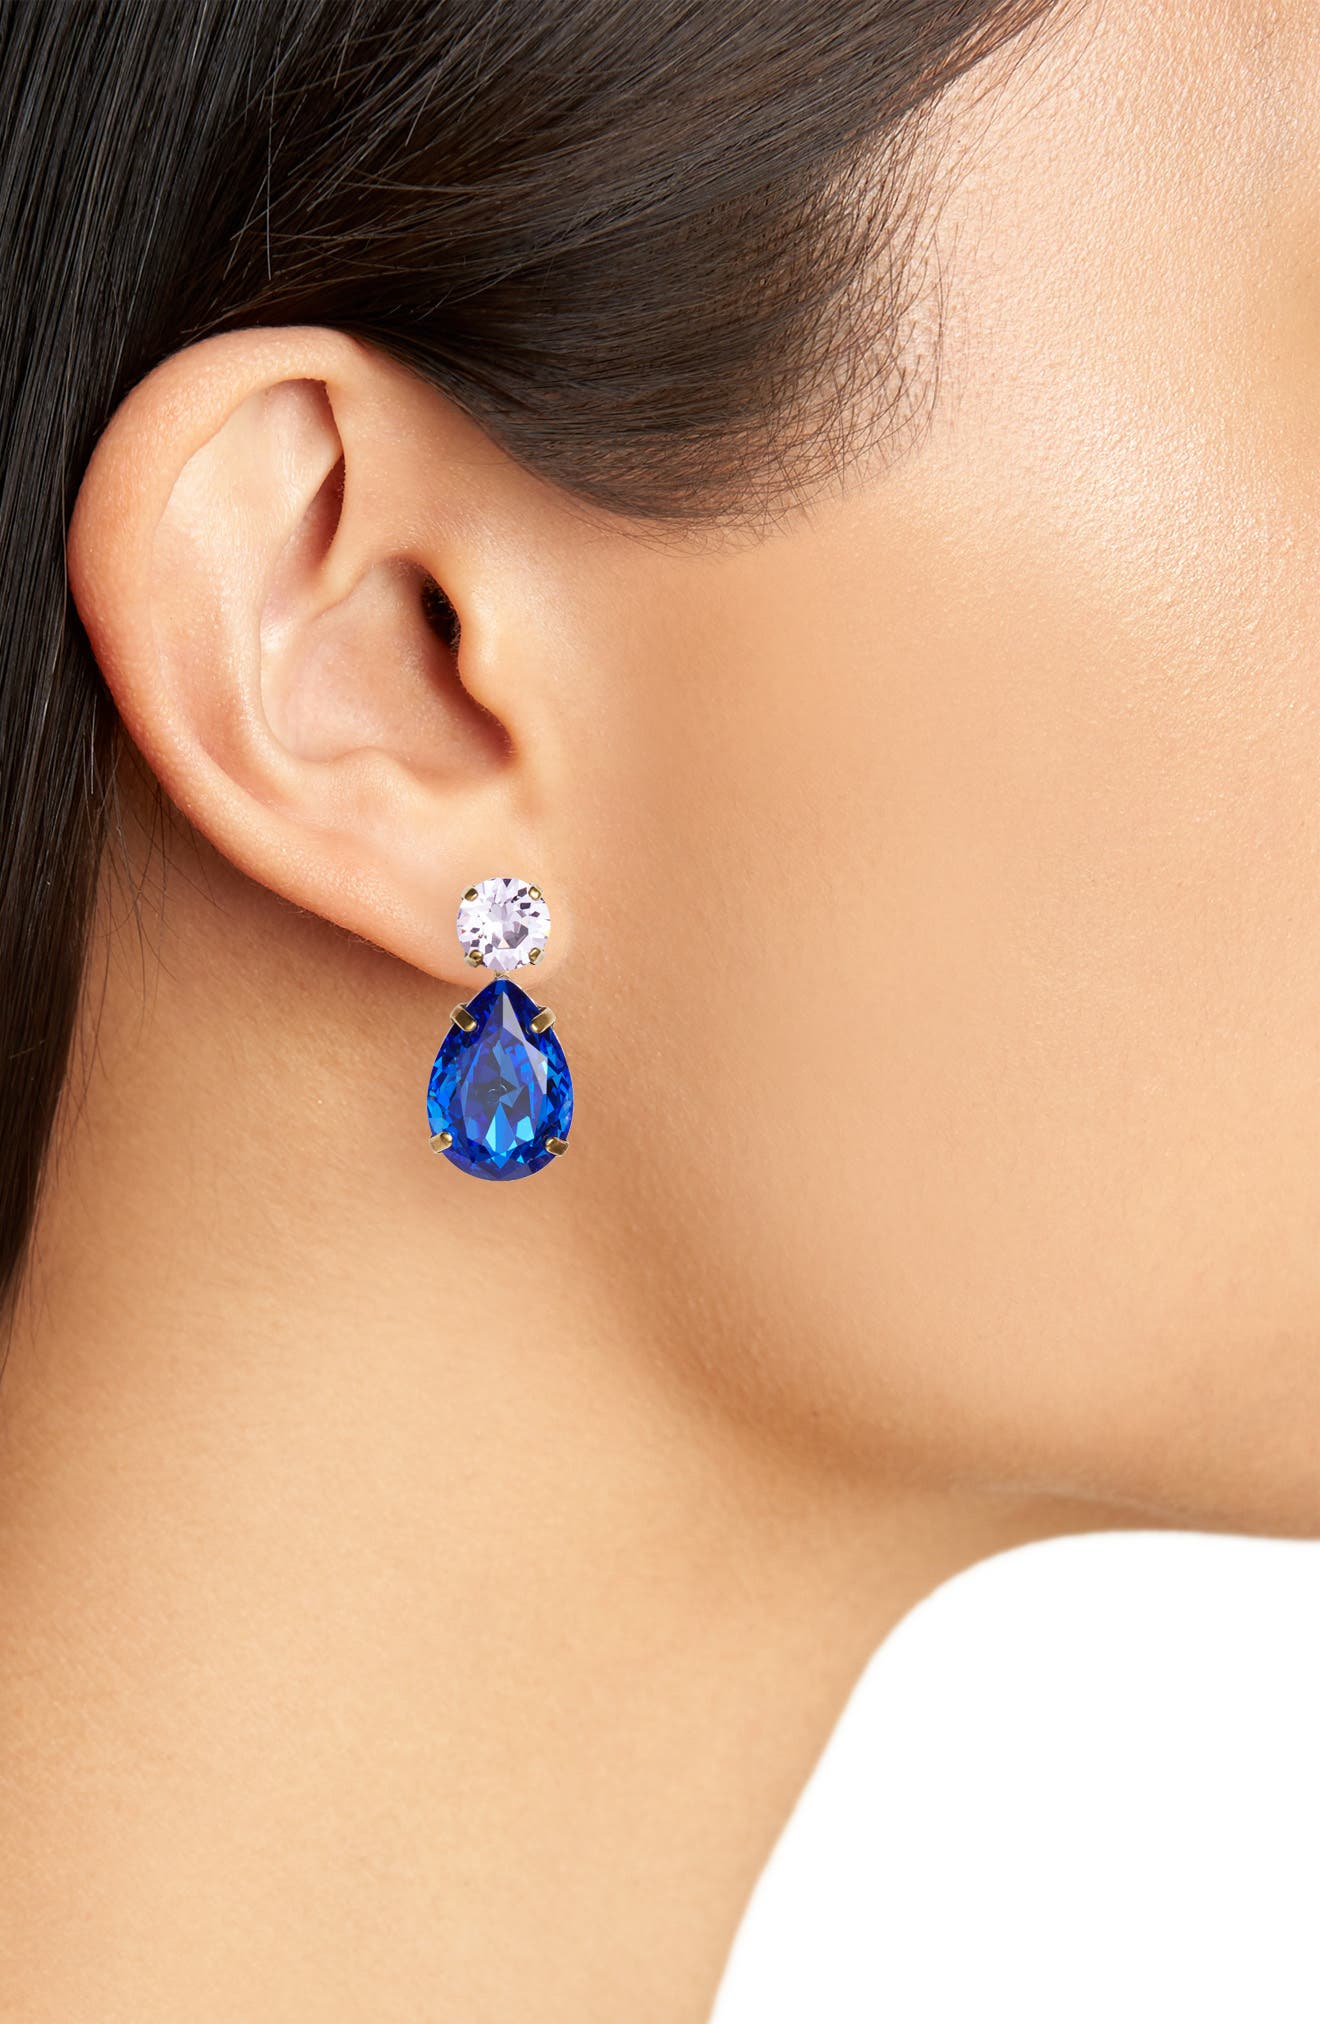 Teardrop Crystal Earrings,                             Alternate thumbnail 2, color,                             BLUE